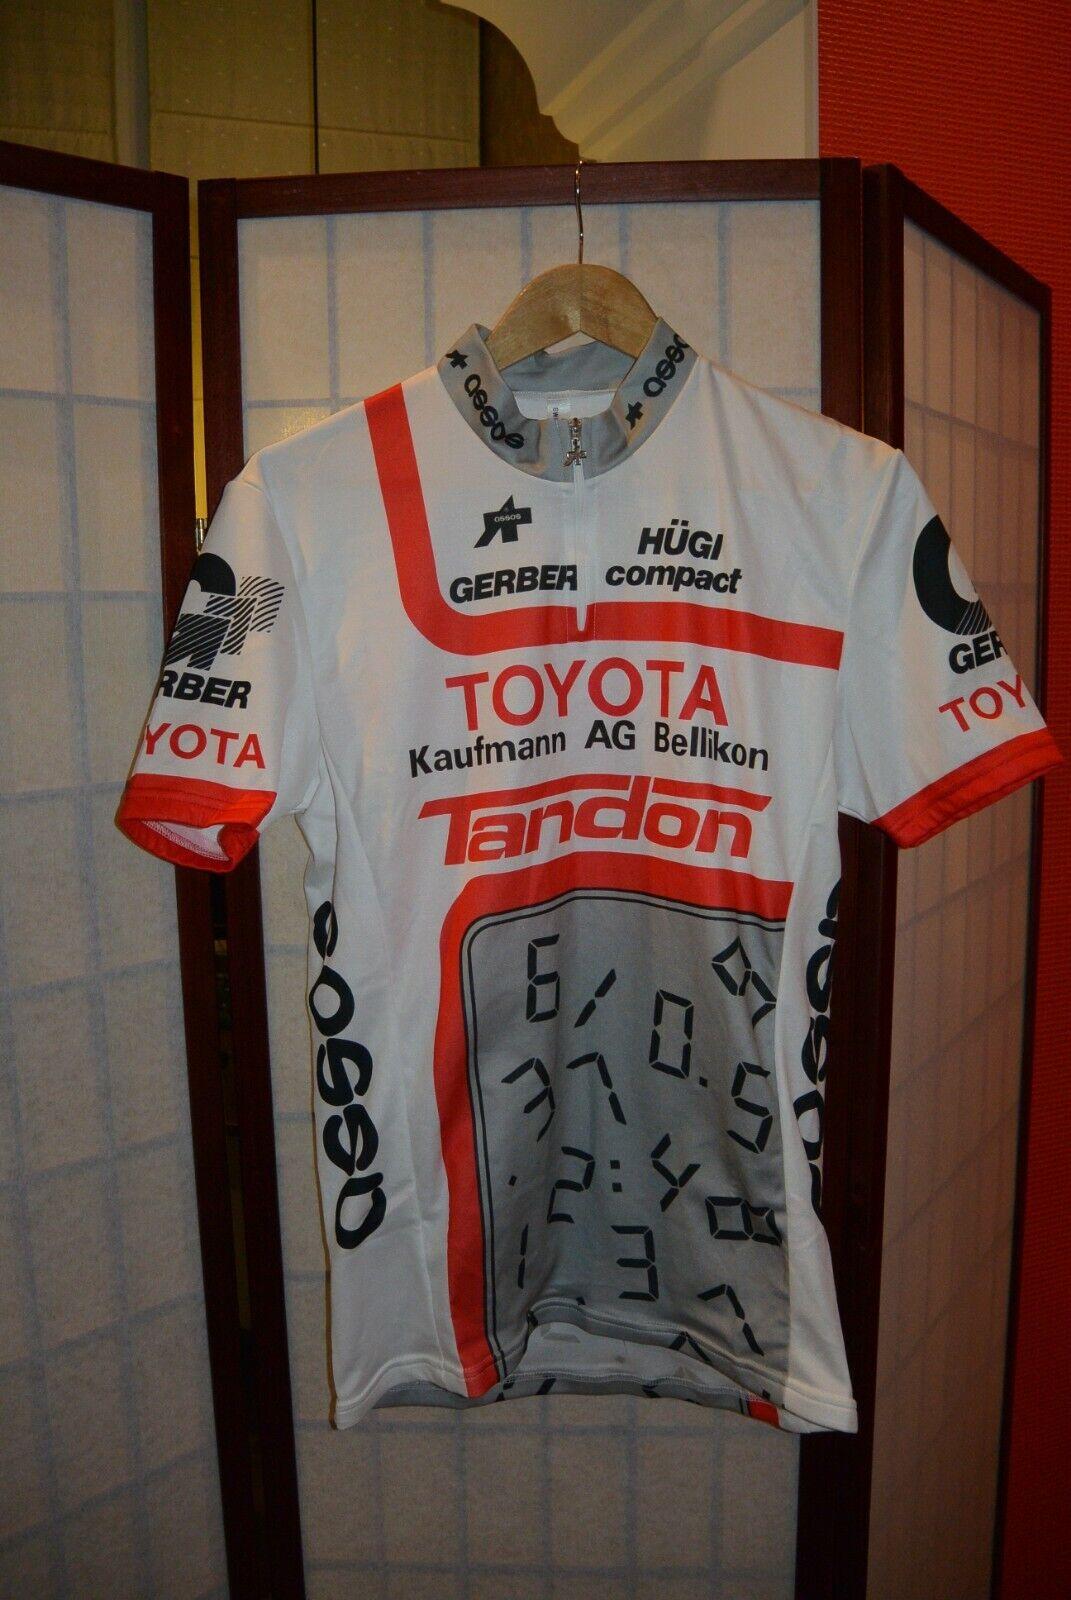 Toyota Tandon Assos retro vintage cycling jersey